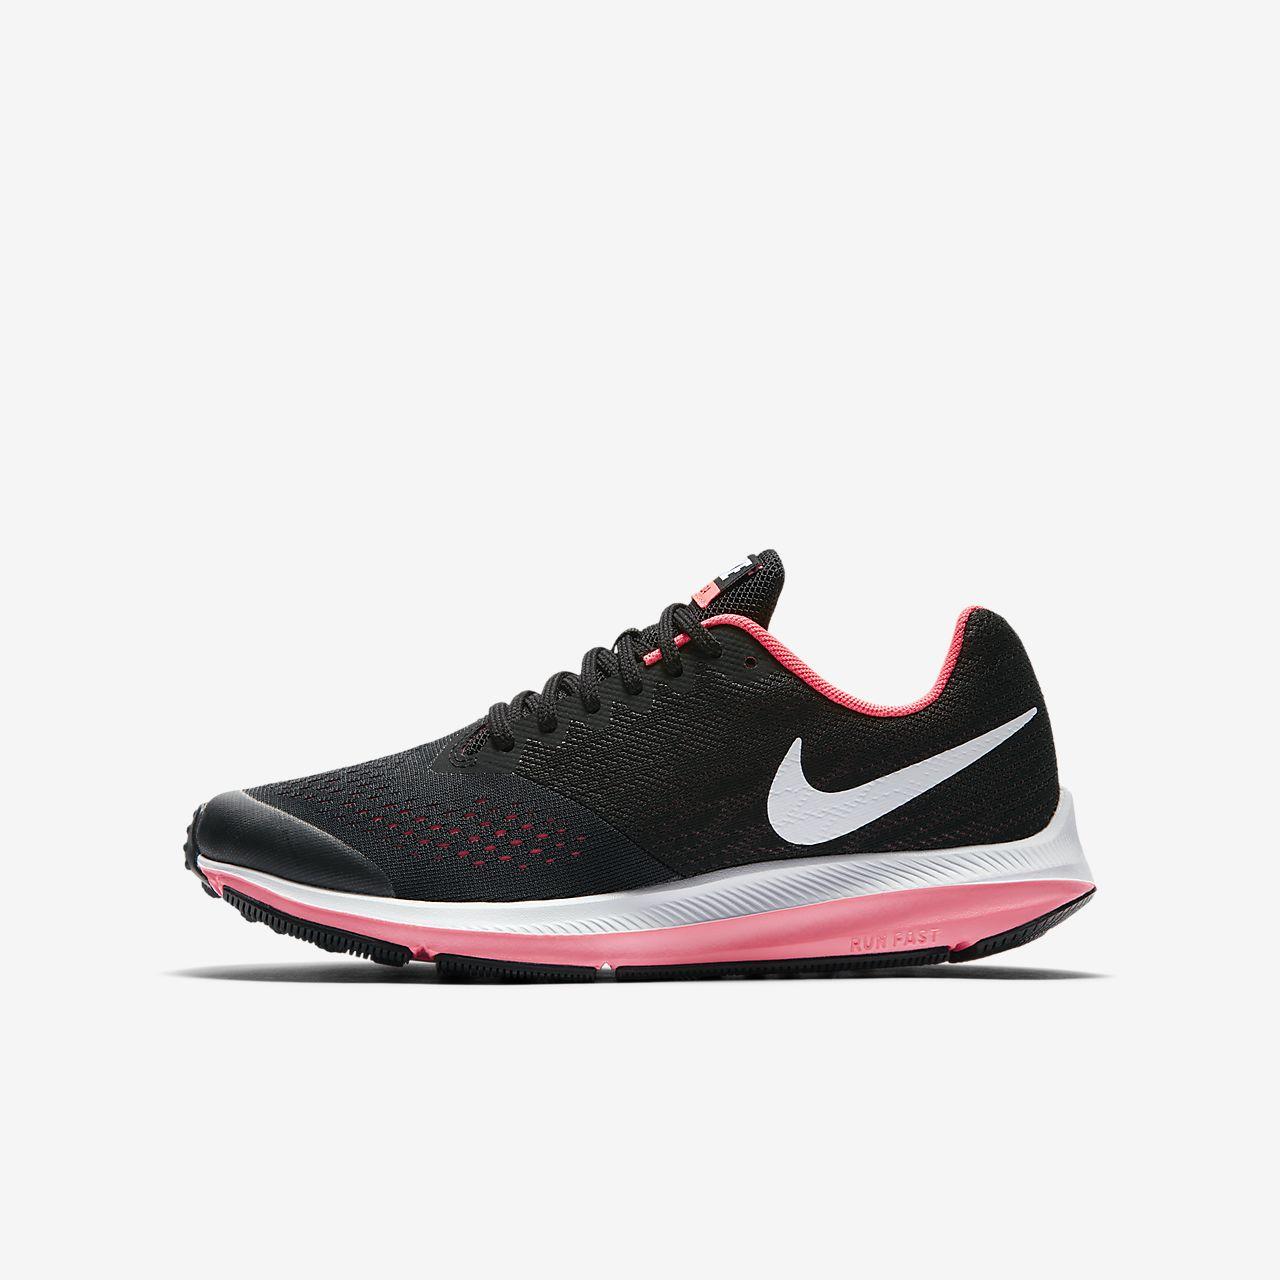 zapatillas de running de hombre air zoom winflo 4 nike